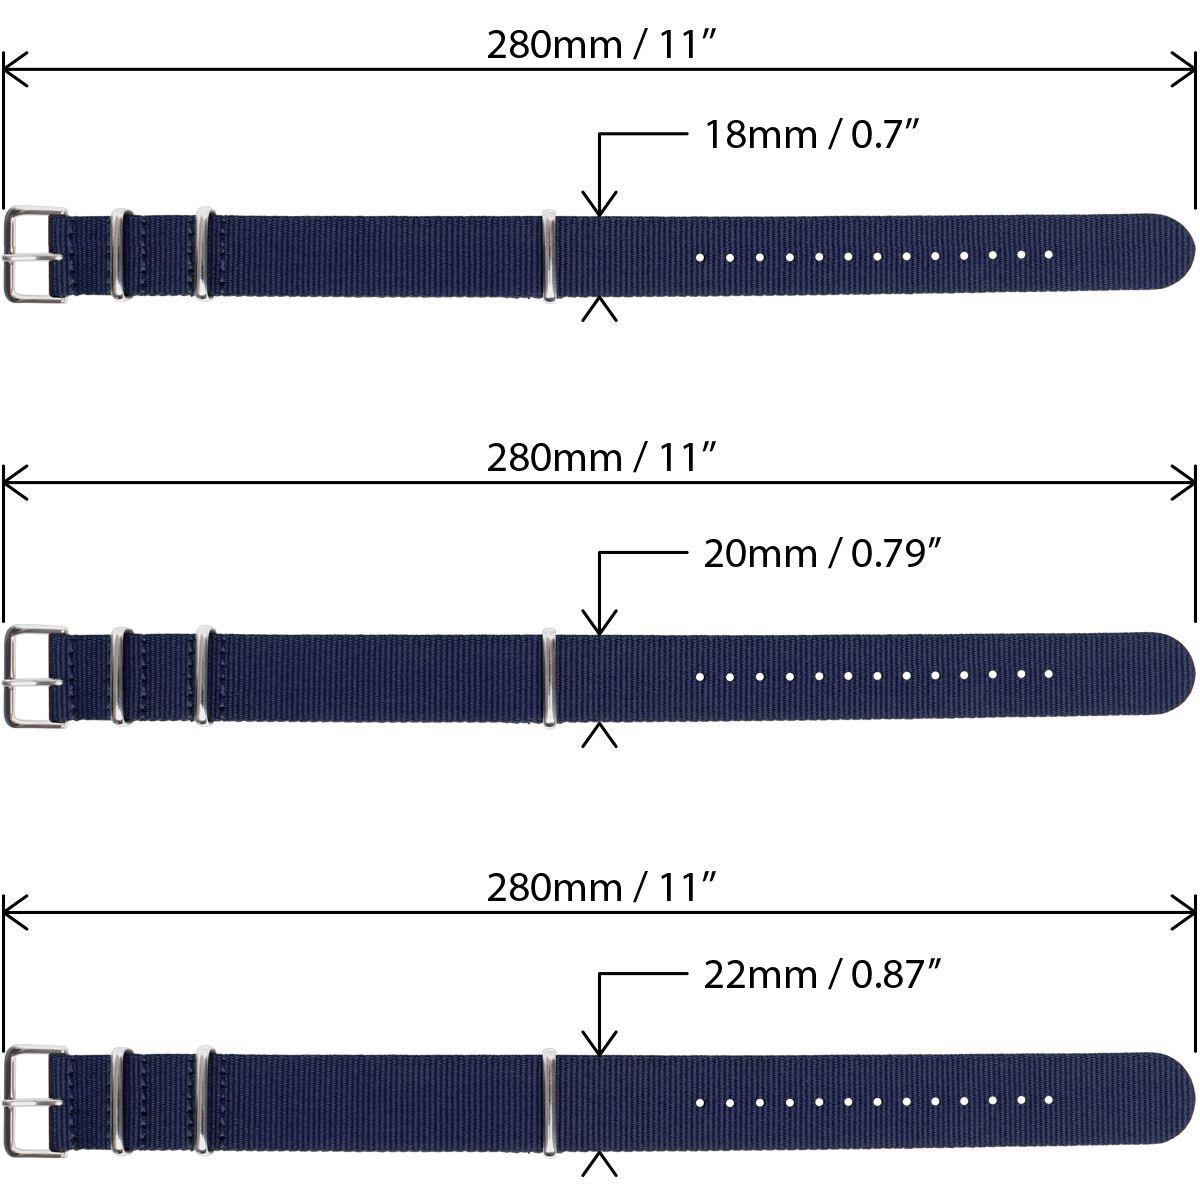 Nato-Watch-Strap-Nylon-Men-Wrist-18mm-20mm-22mm-Smart-Military-Pin-Straps miniatuur 28